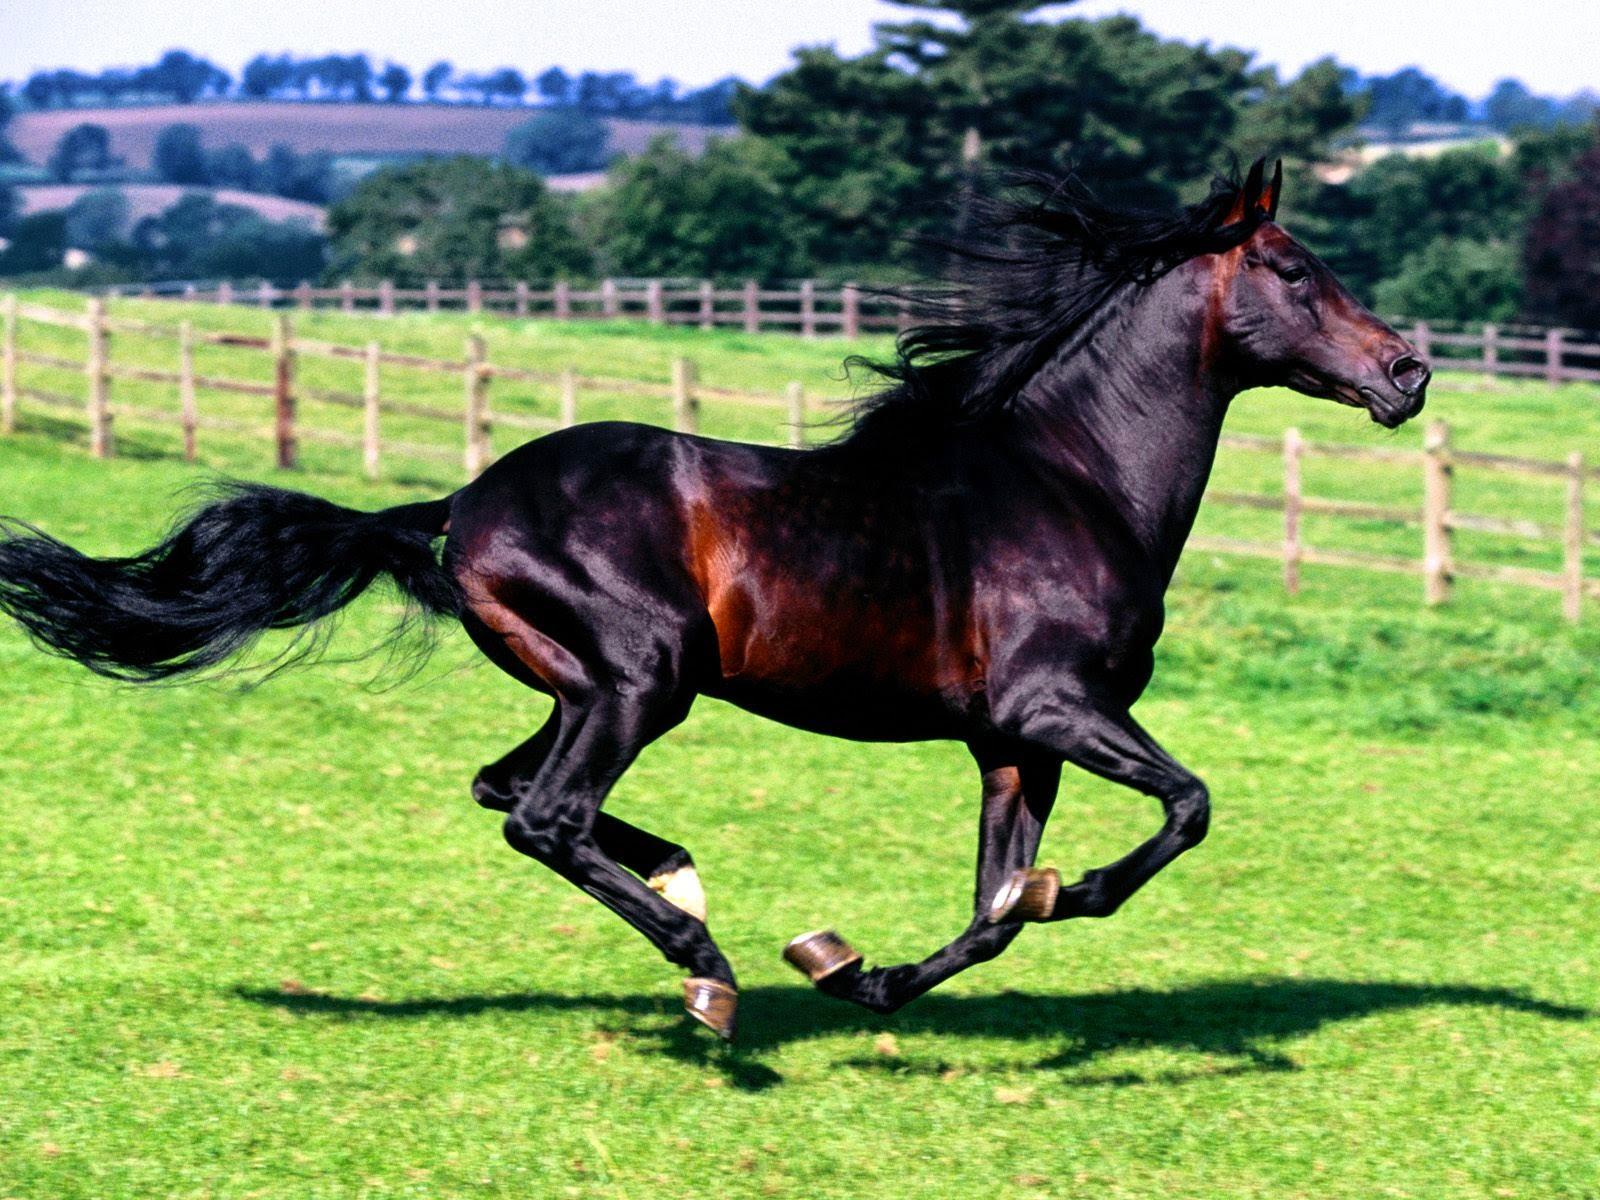 Wonderful   Wallpaper Horse Samsung Galaxy - Horse%2BHD%2BWallpapers%2B(5)  Perfect Image Reference_69532.jpg